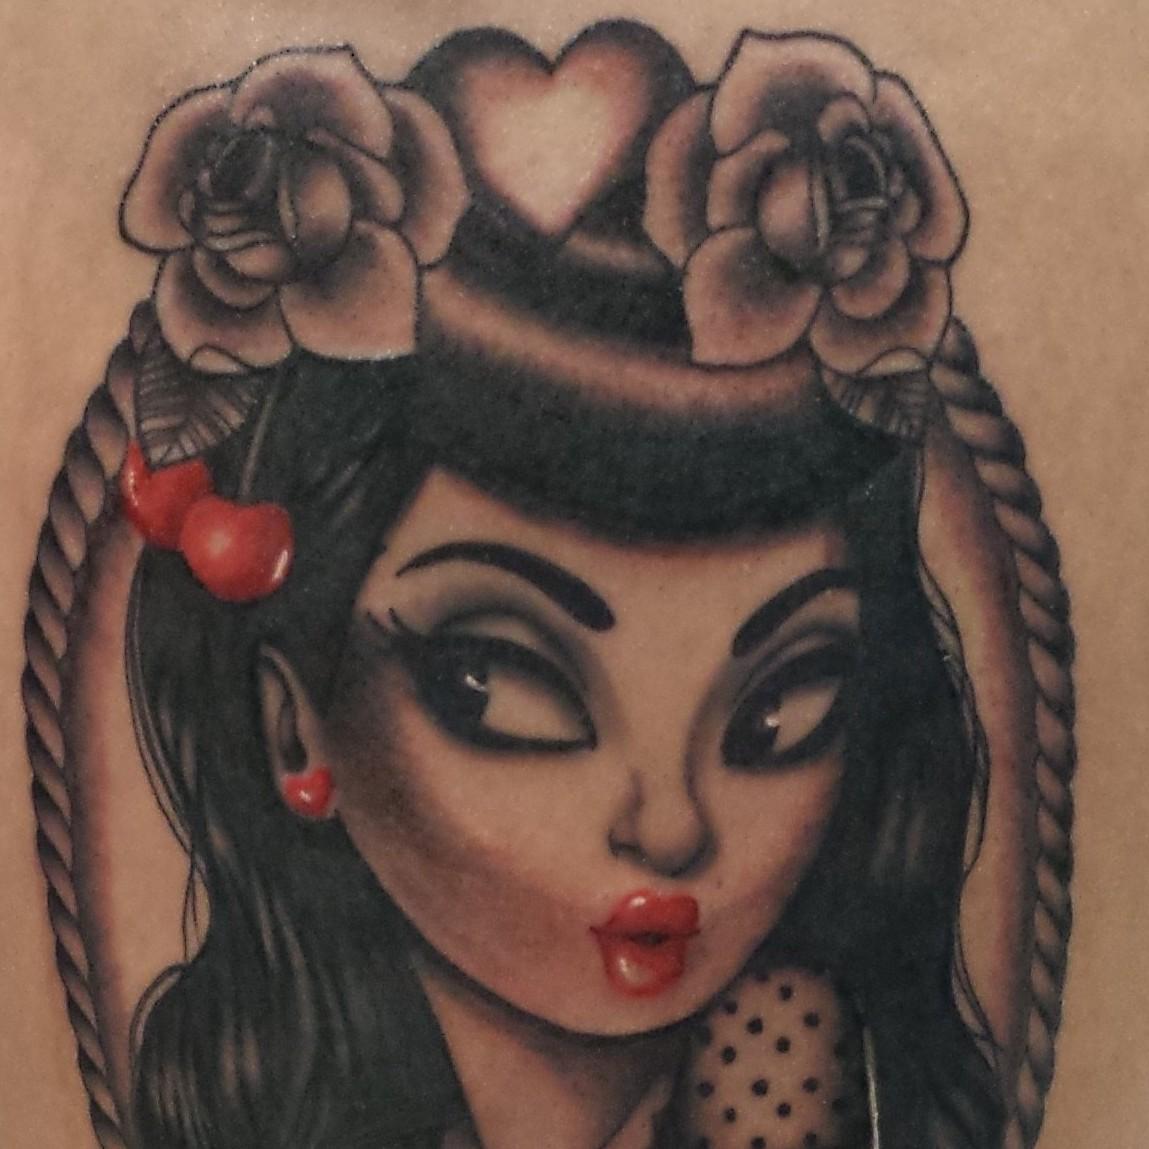 Meloncrew Tattoo & Piercing